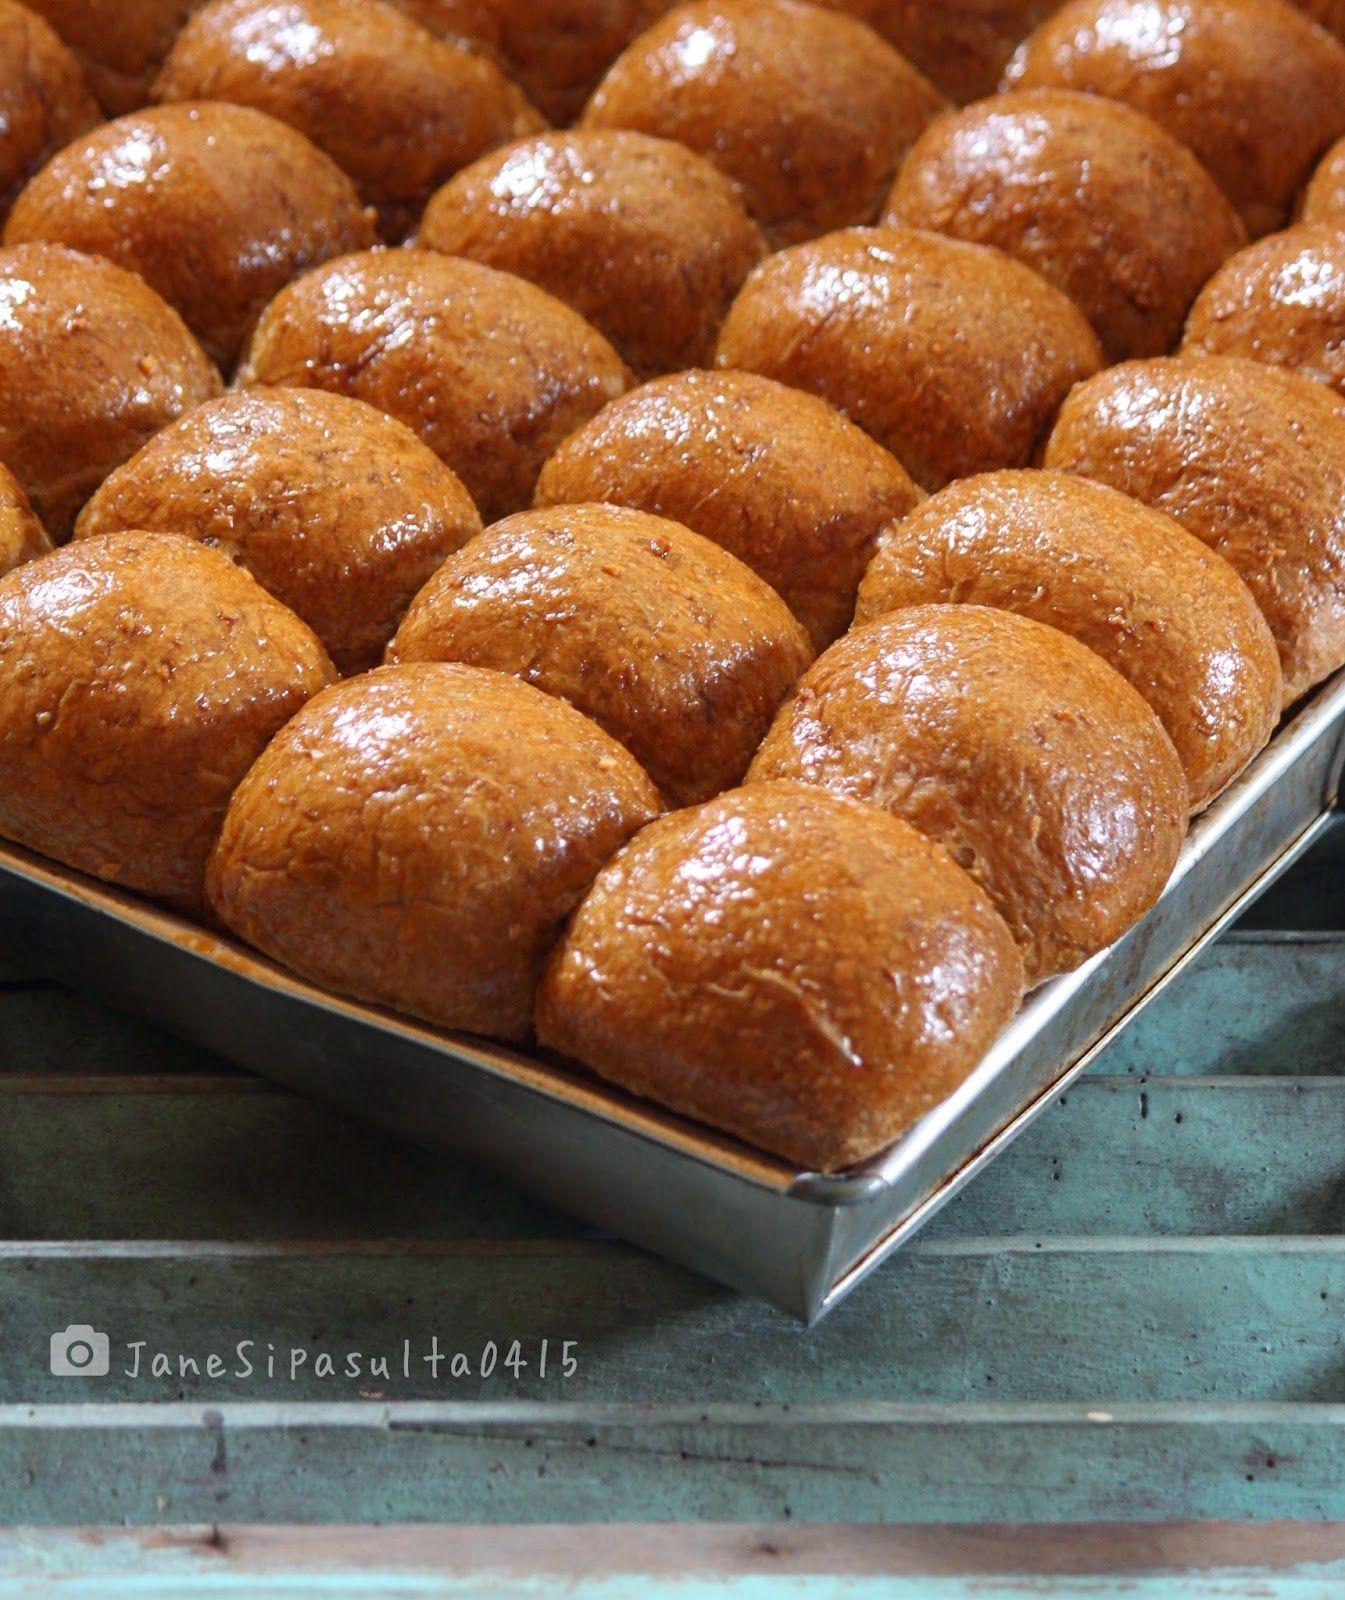 Jane S Kitchen Ampas Terigu Makanan Roti Hot Dog Gula Aren